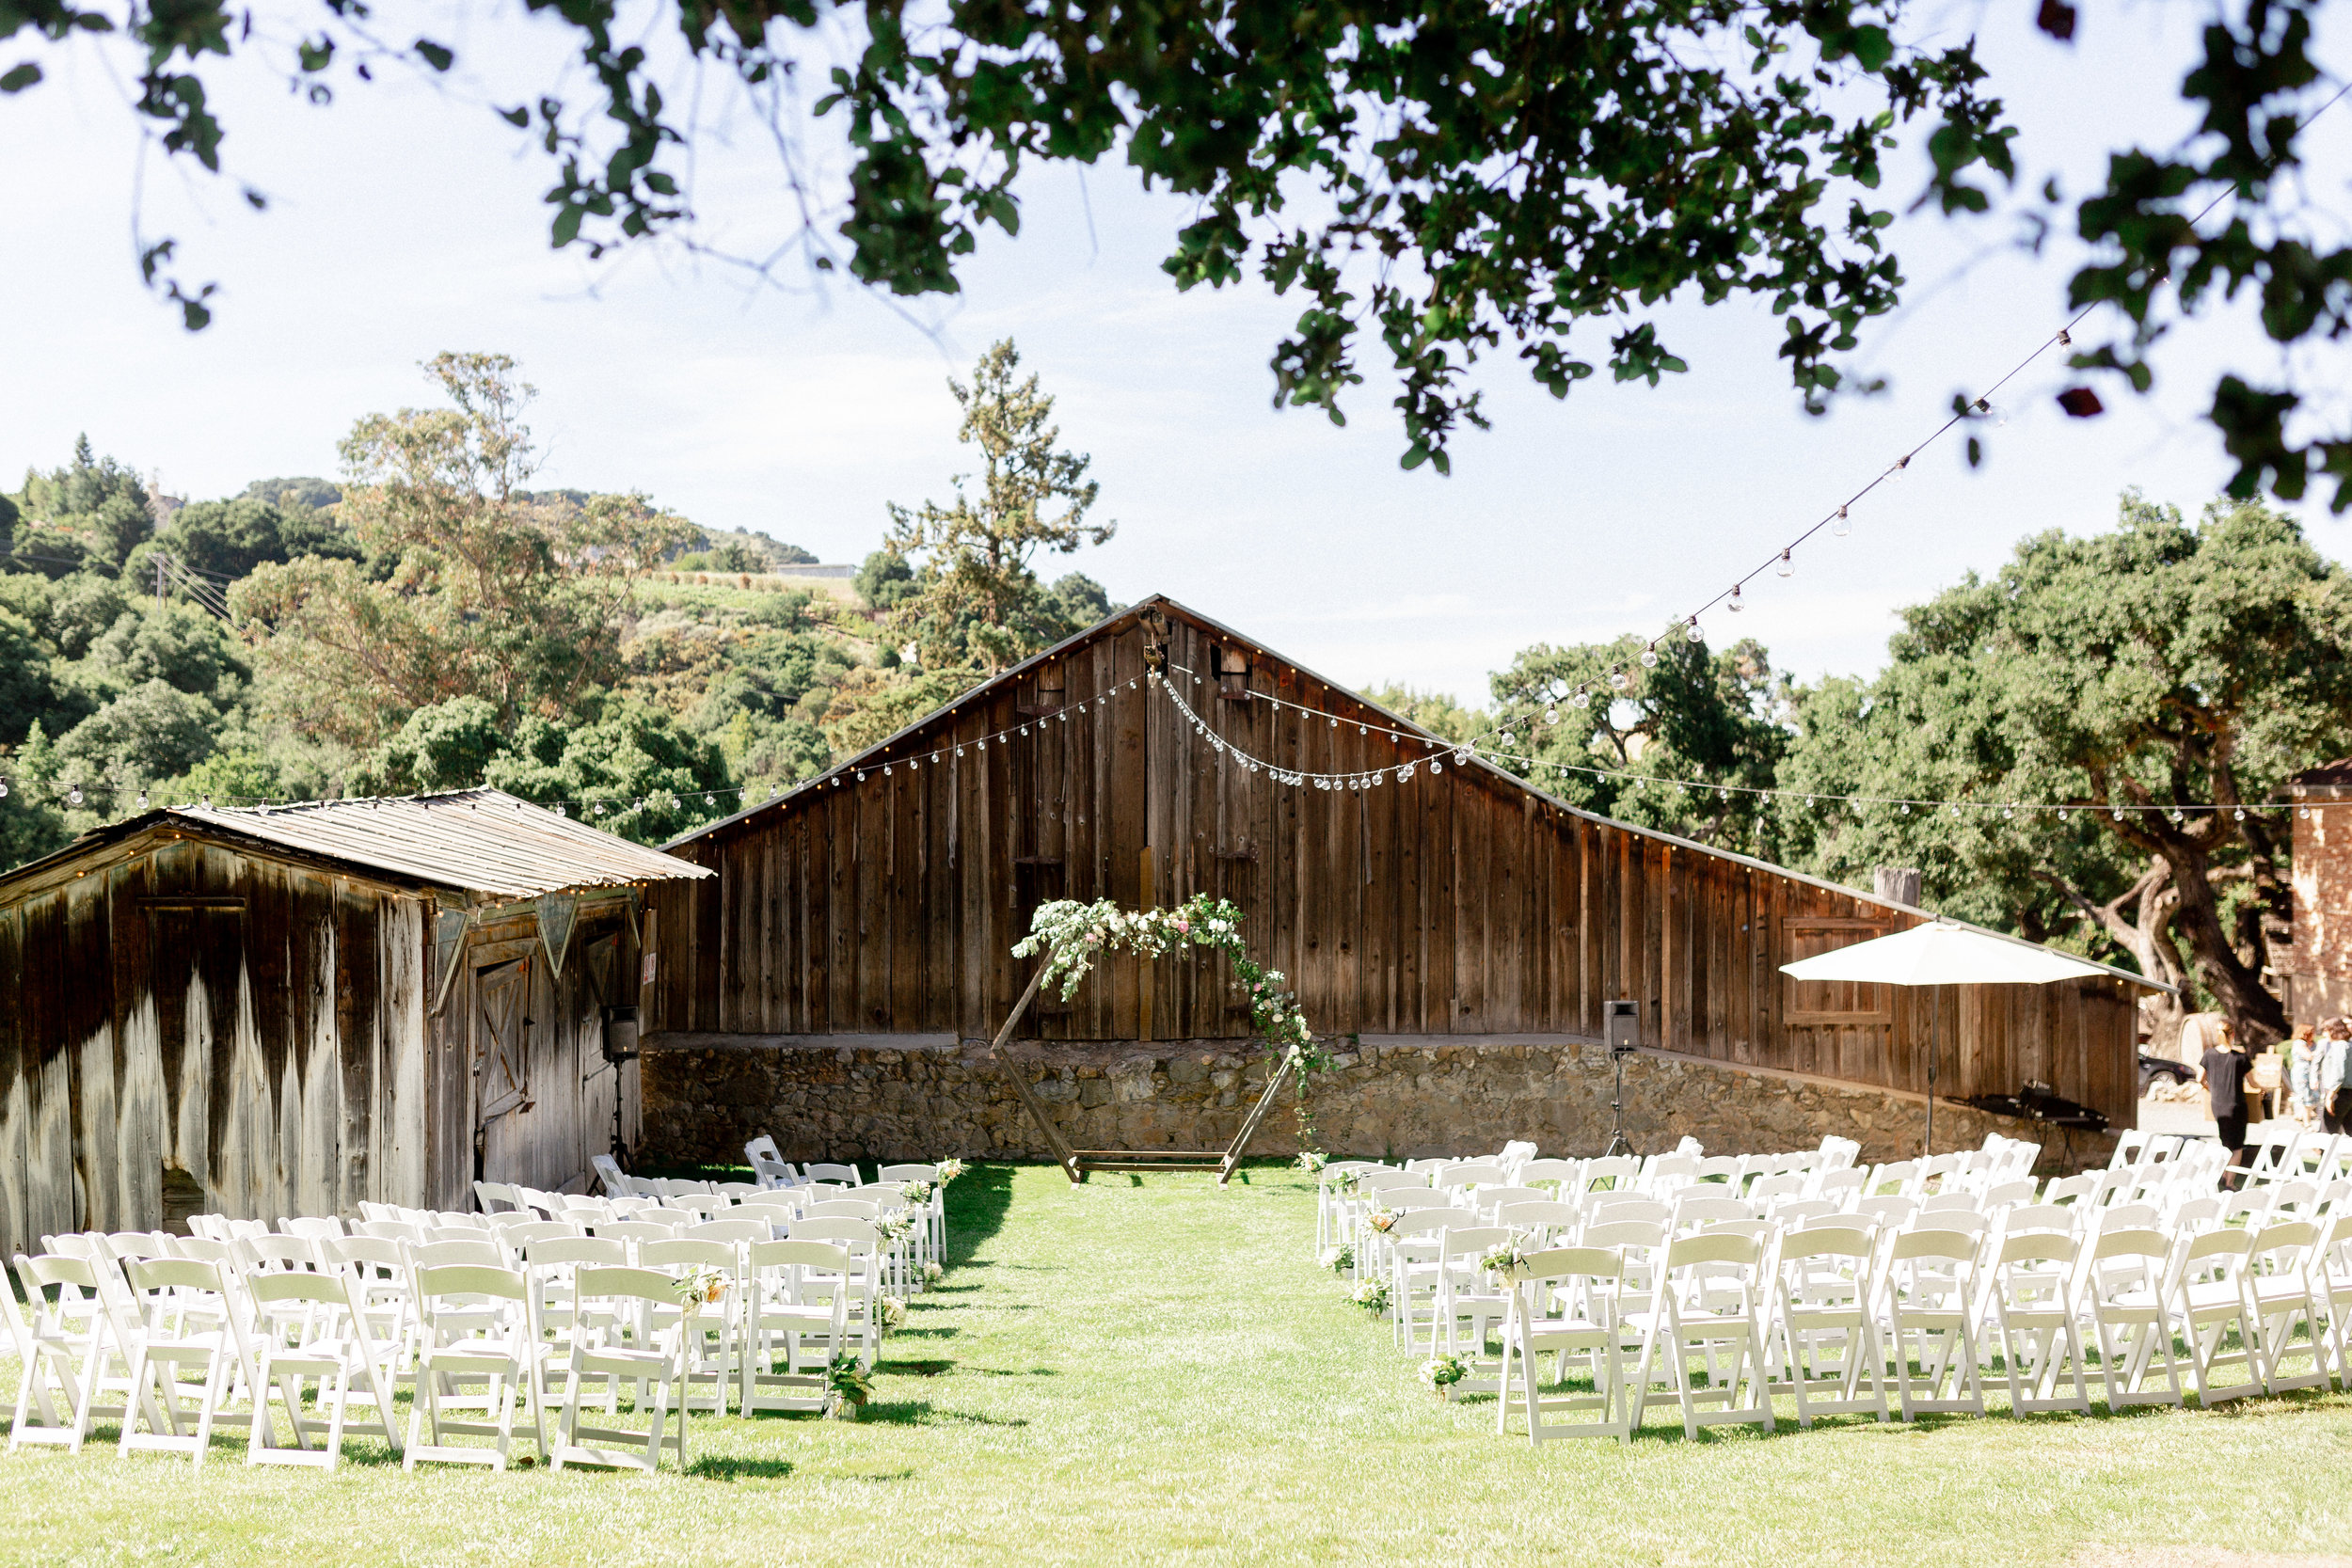 Picchetti-Winery-wedding-photos (85 of 145).jpg